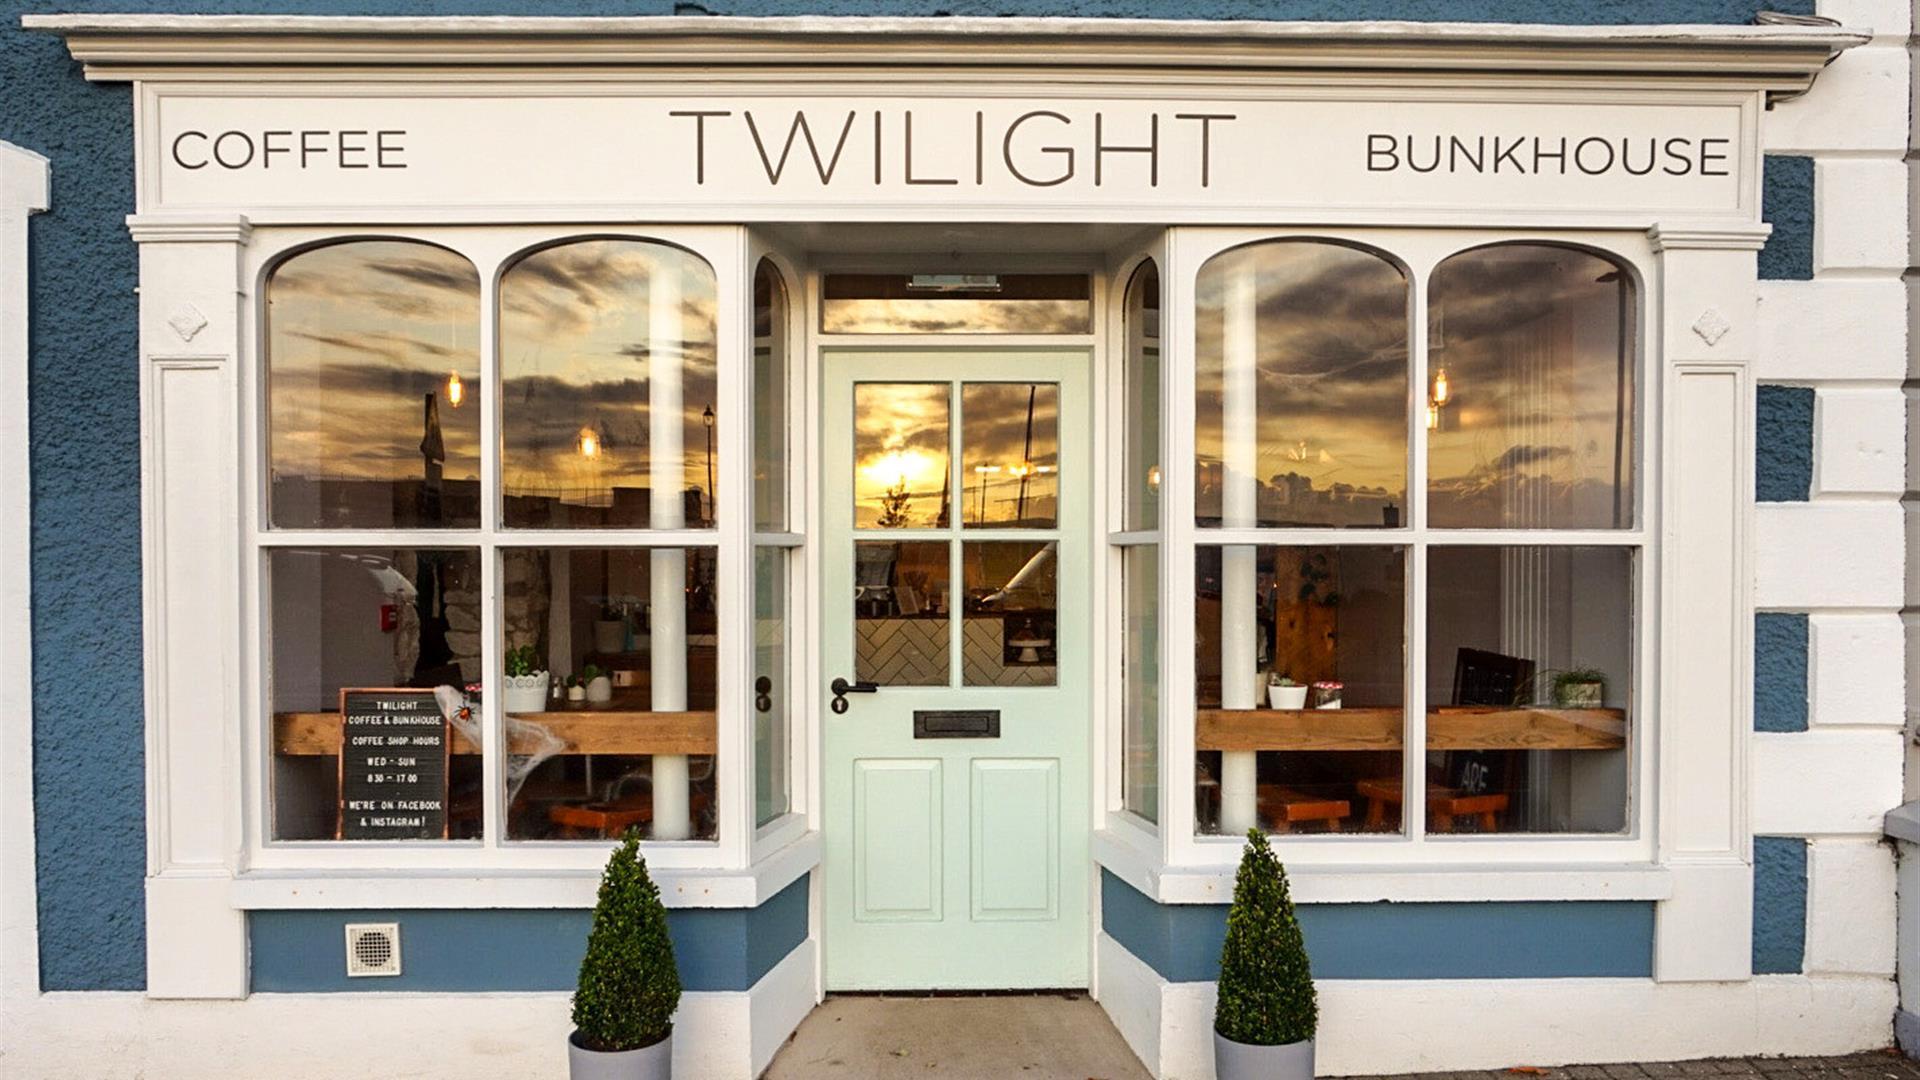 Twilight Bunkhouse